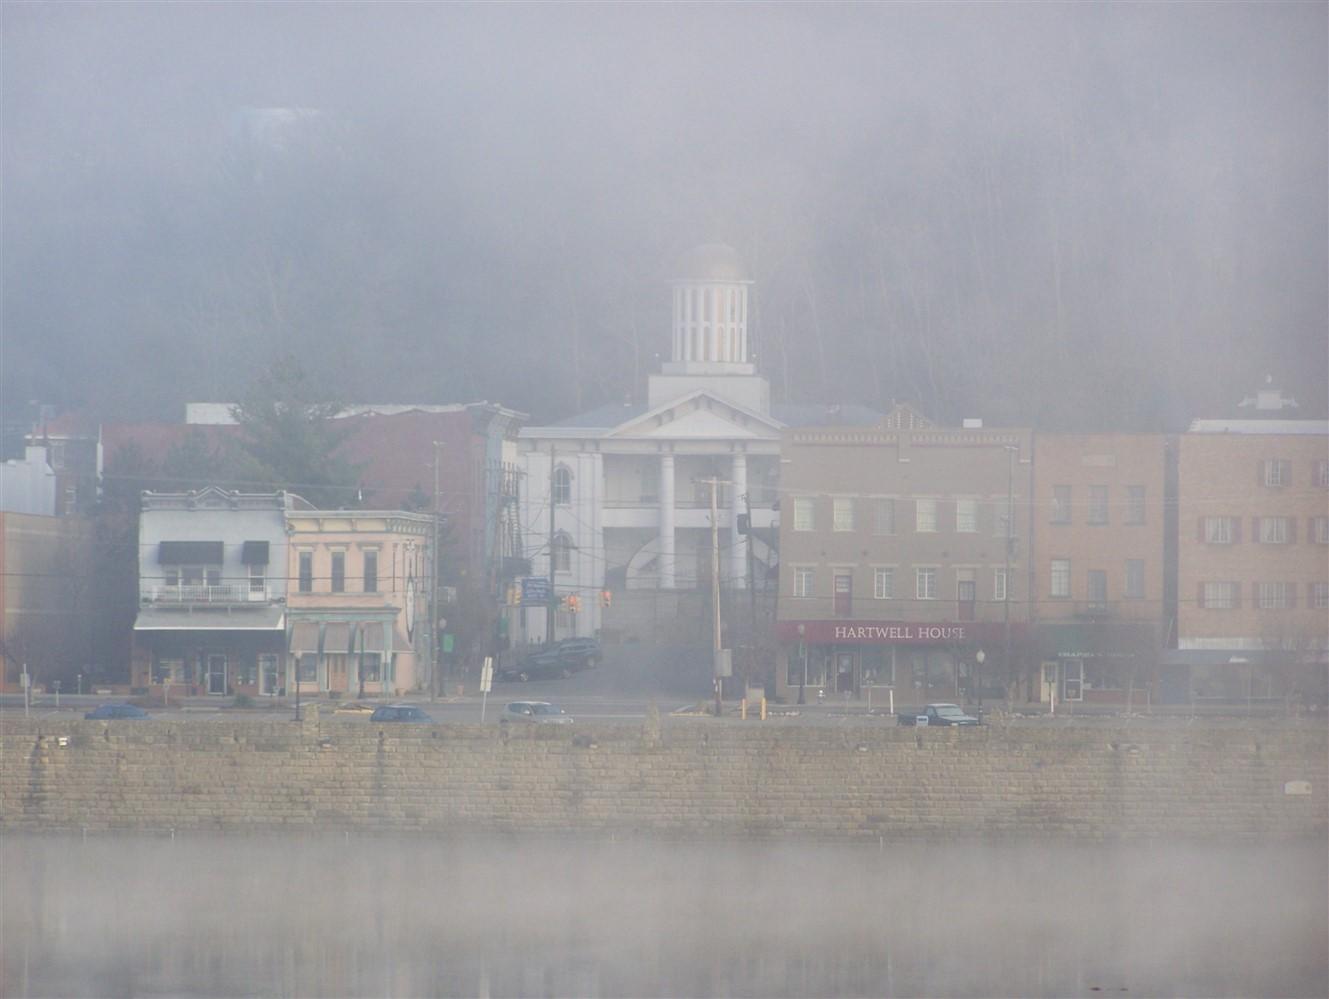 2008 03 25 3 Pomeroy Ohio.jpg